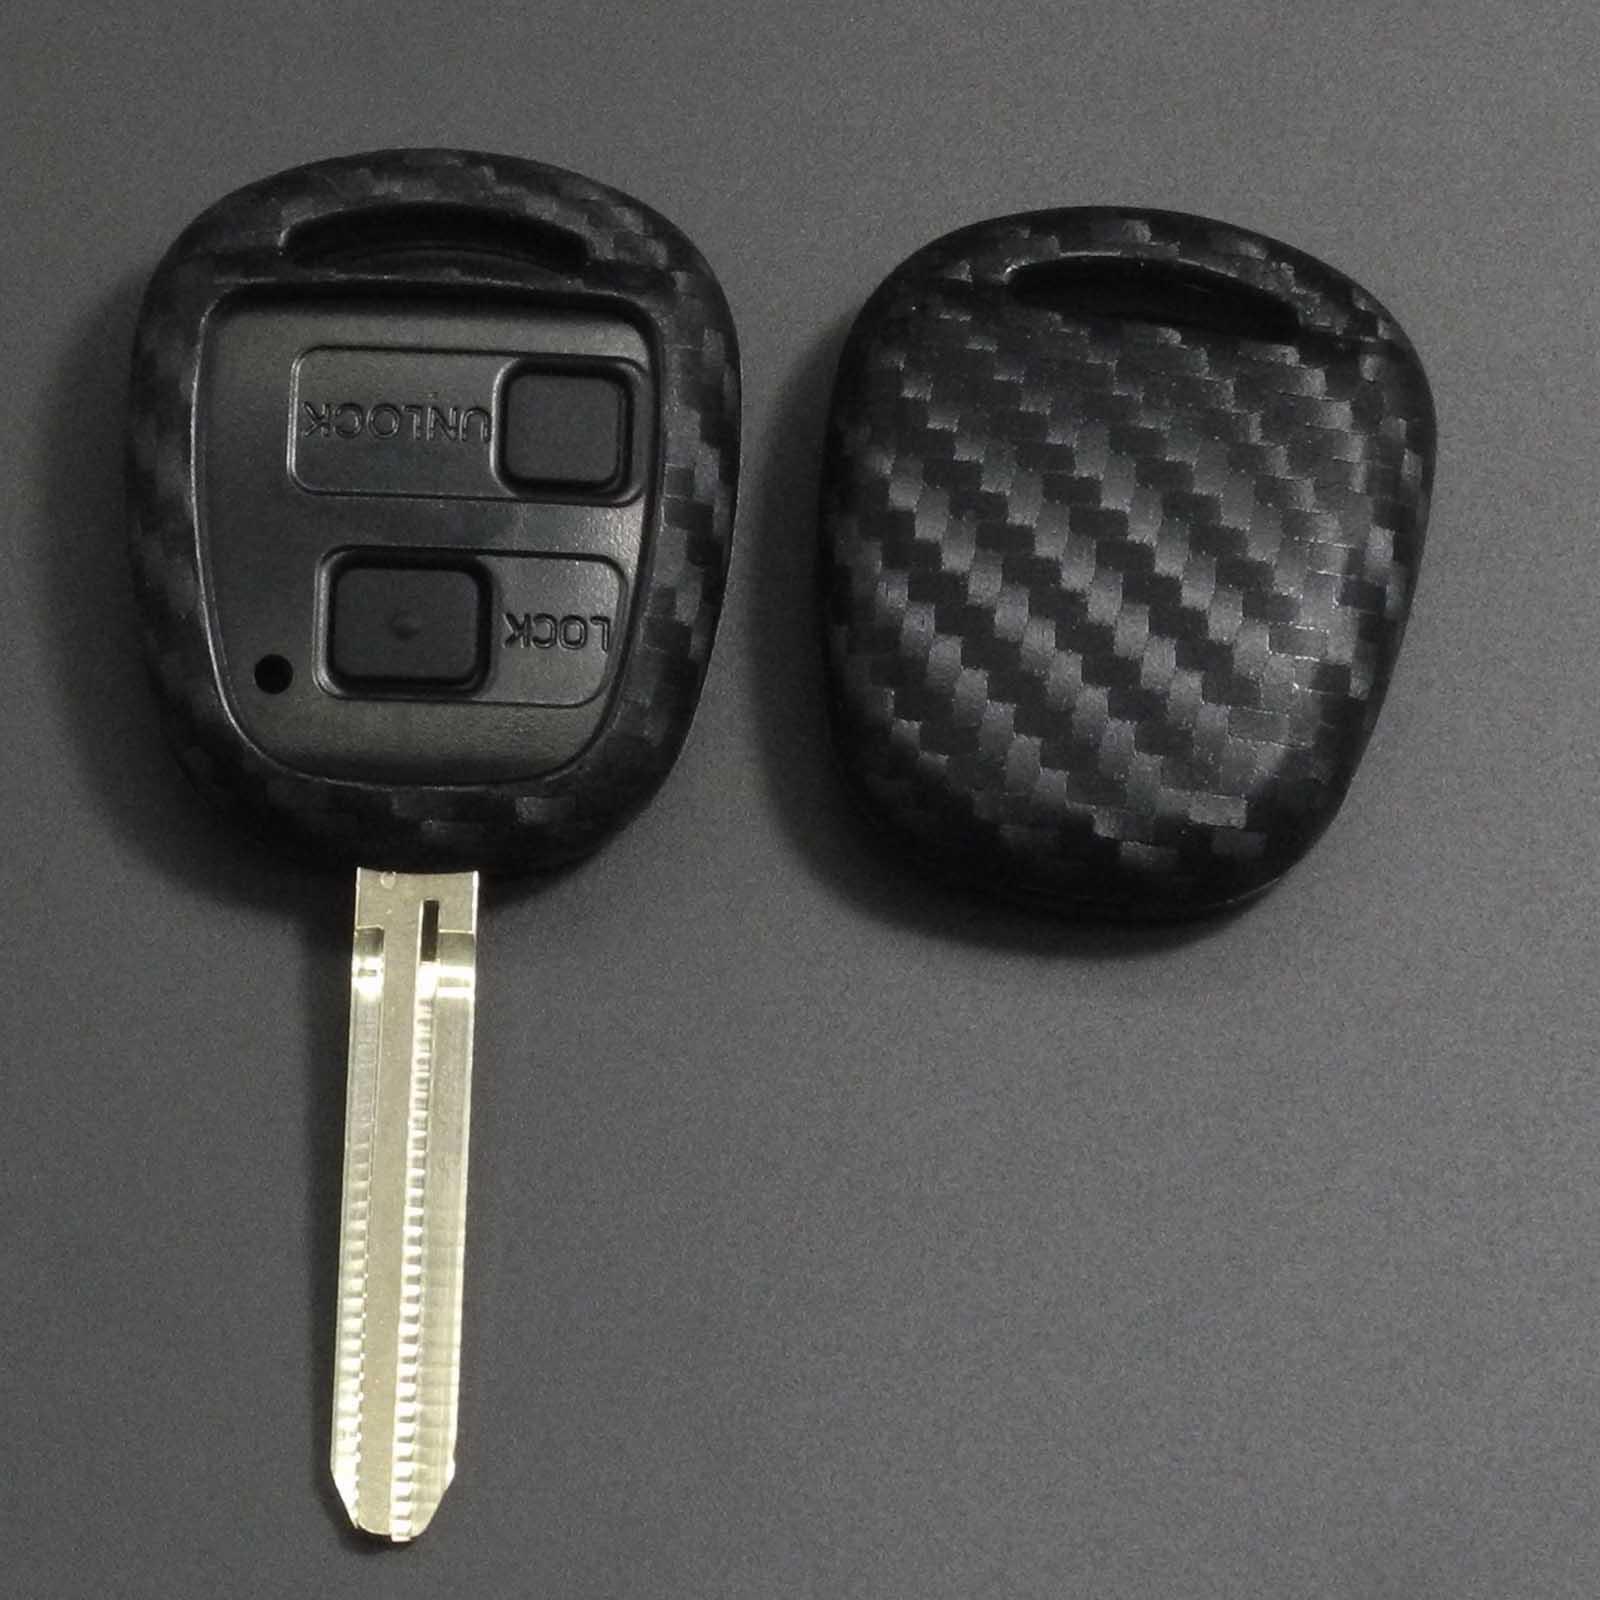 Jingyuqin Carbon Silicone Car Remote Key Fob Case Cover For TOYOTA CAMRY RAV4 Corolla PRADO YARIS Protective Shell Keychain